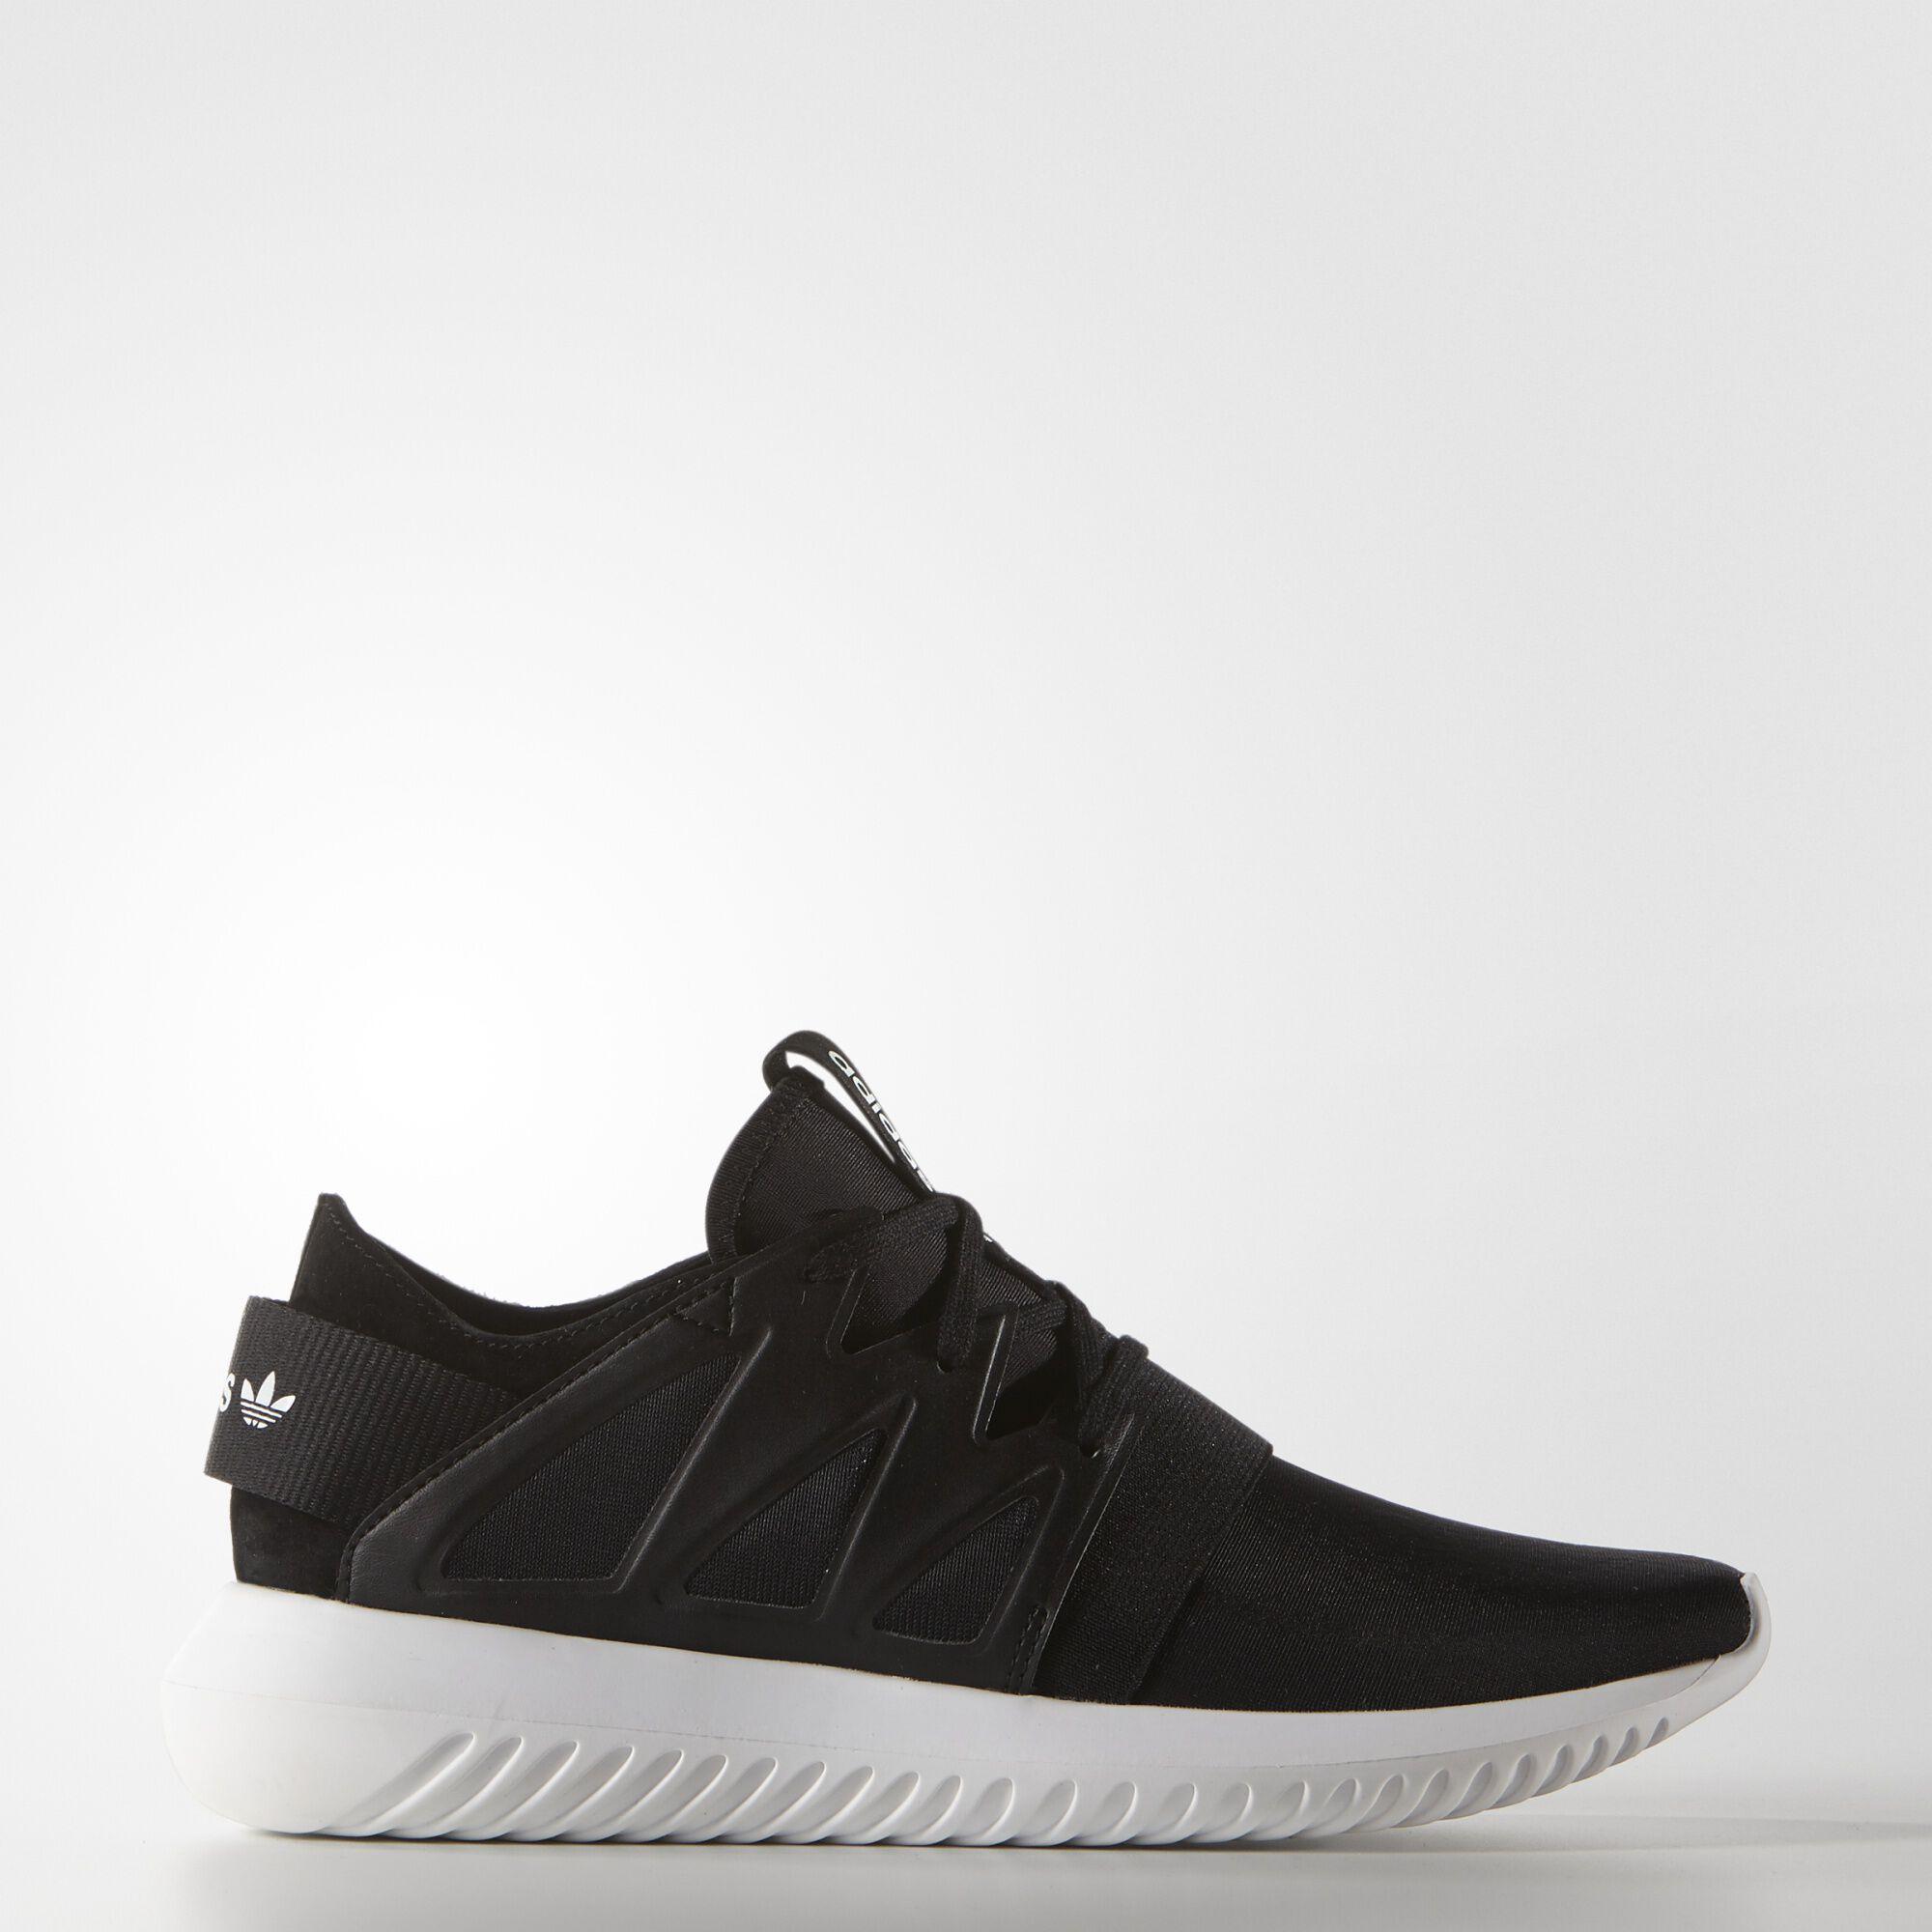 Adidas Tubular Viral